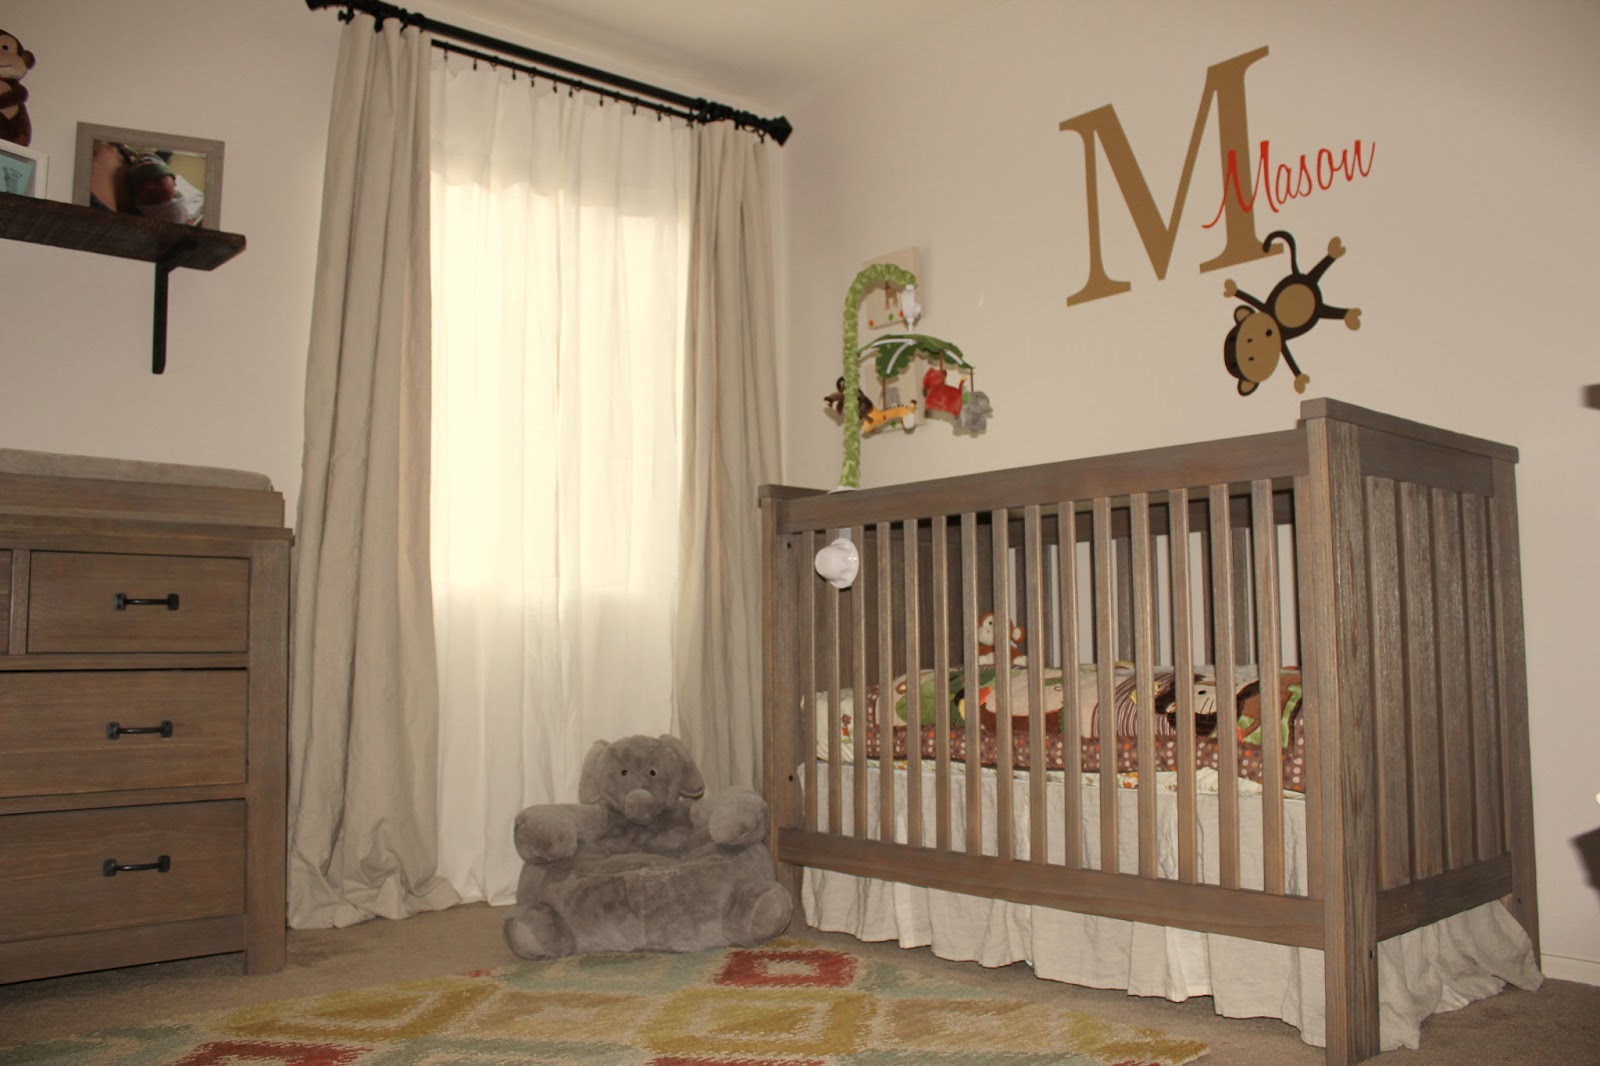 European Farmhouse Charm A Sweet Nursery For Mason